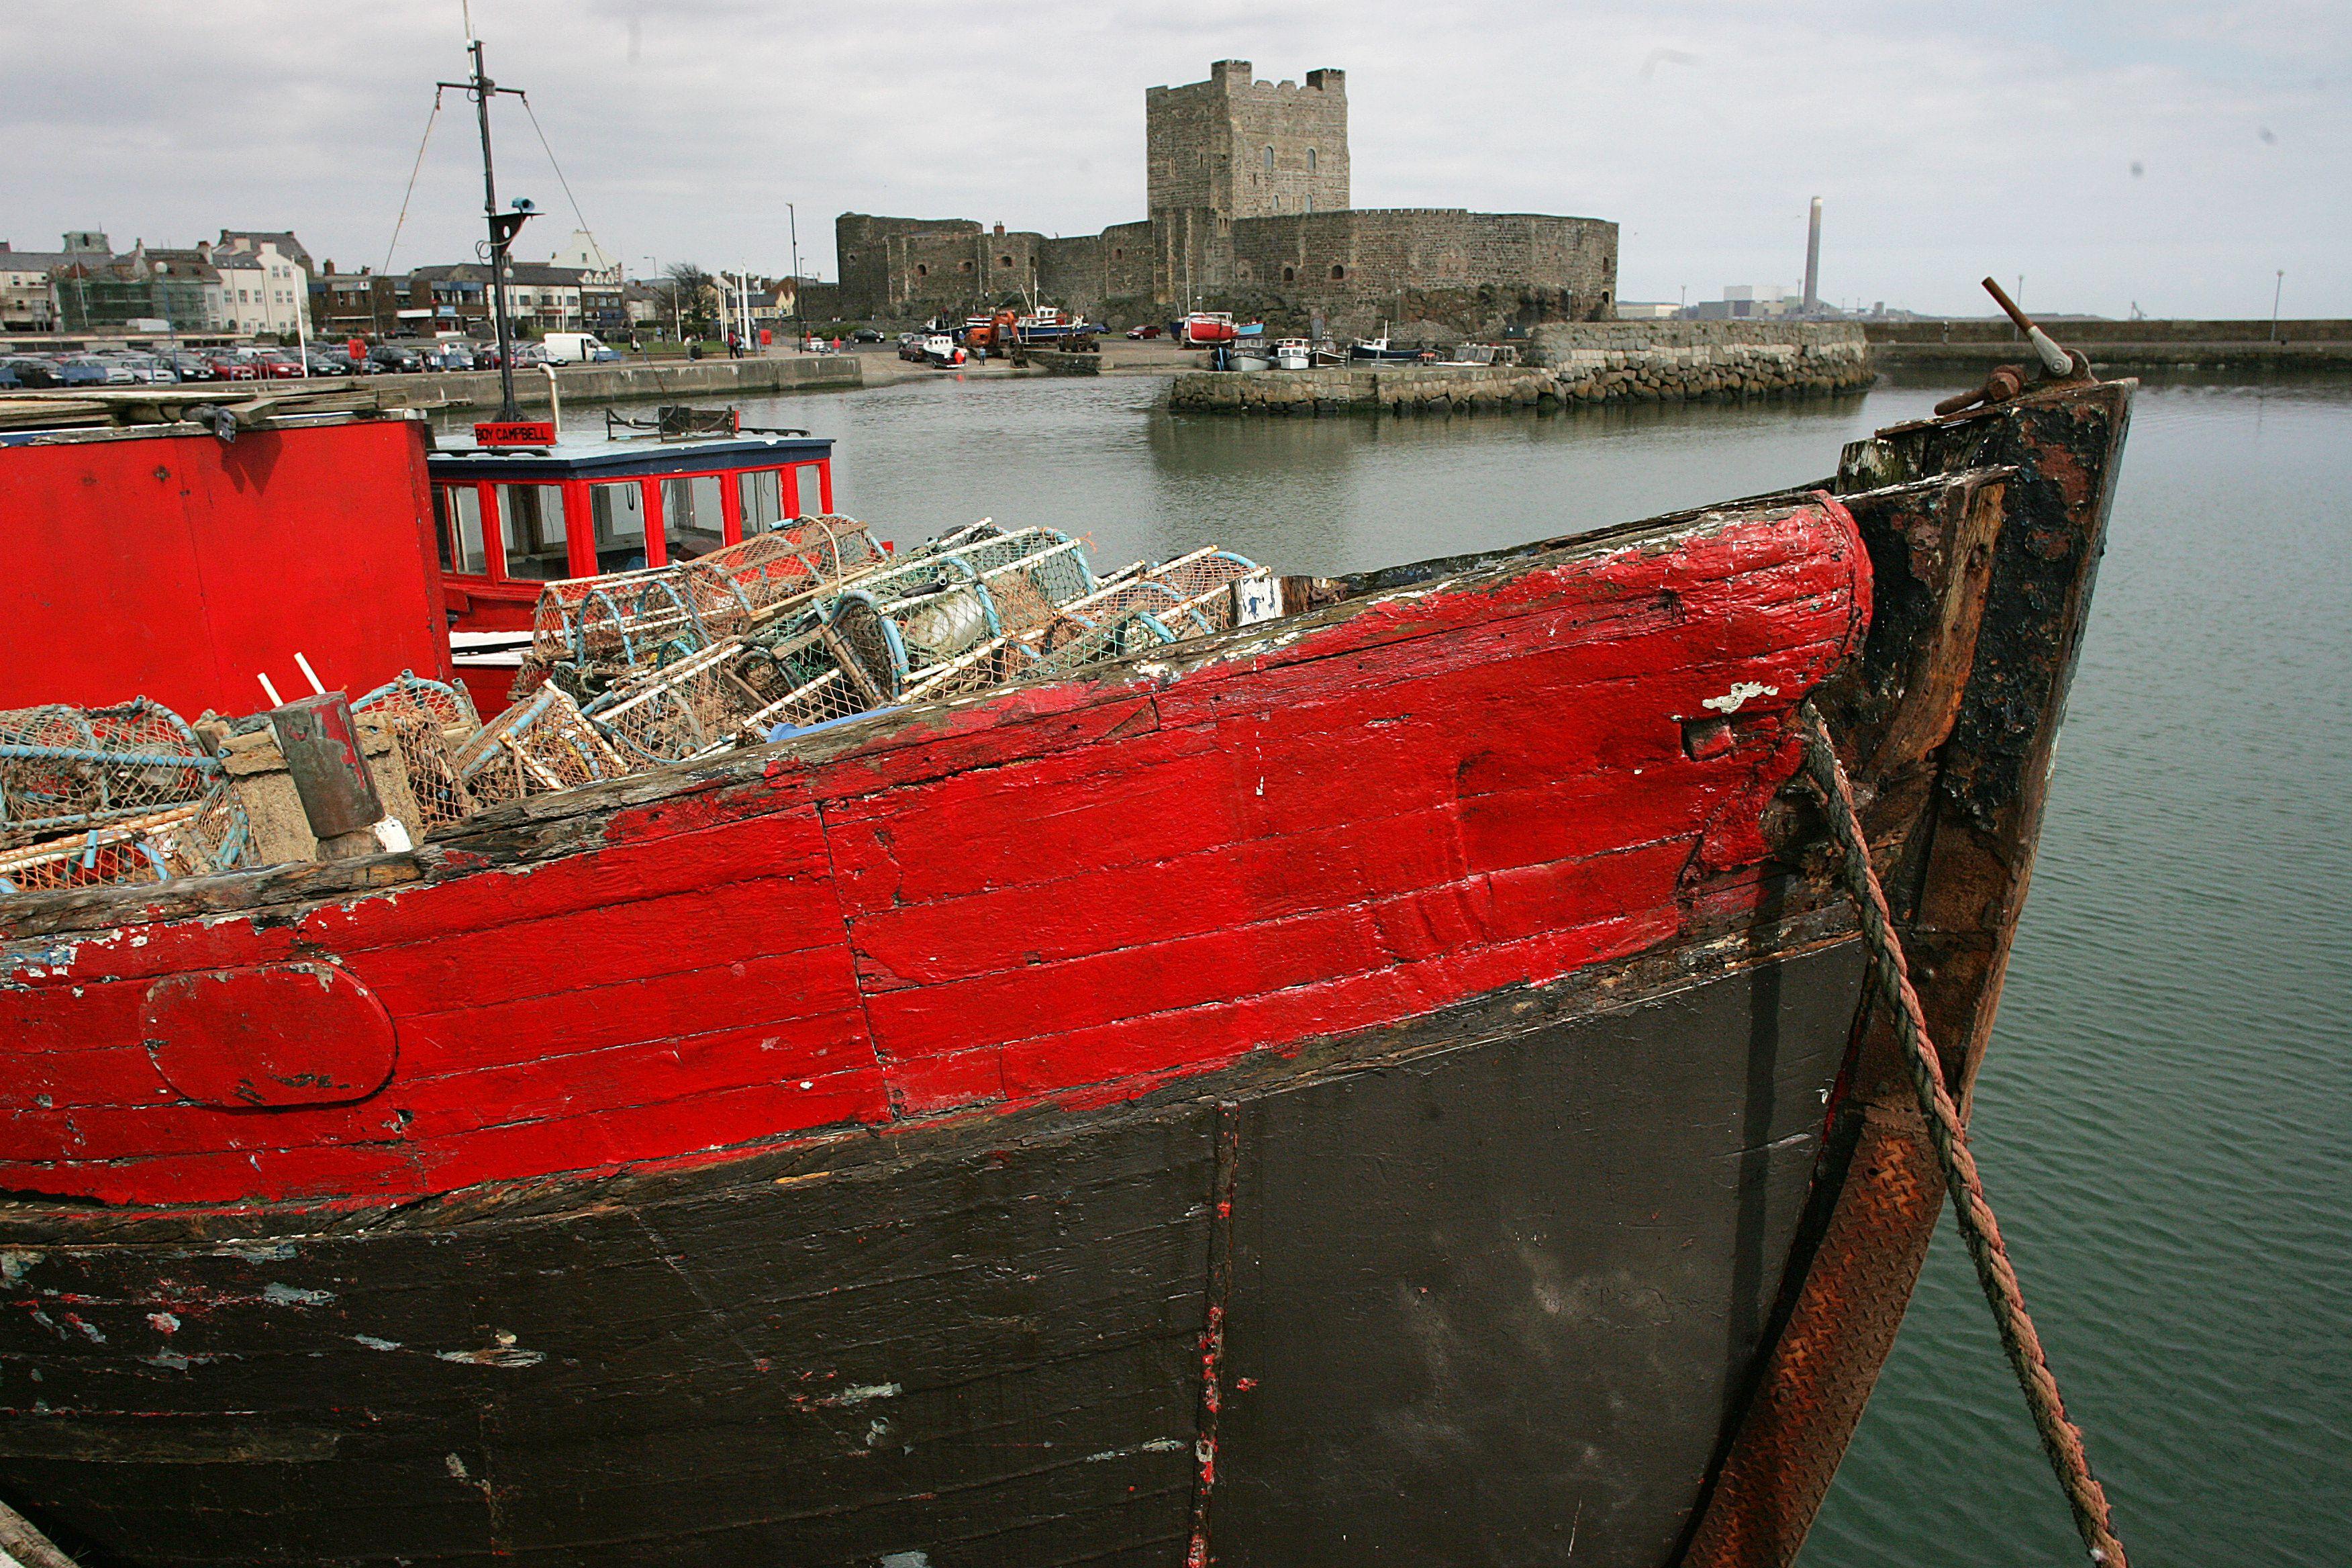 ARTICLE 16:Policing the sea border at Carrickfergus